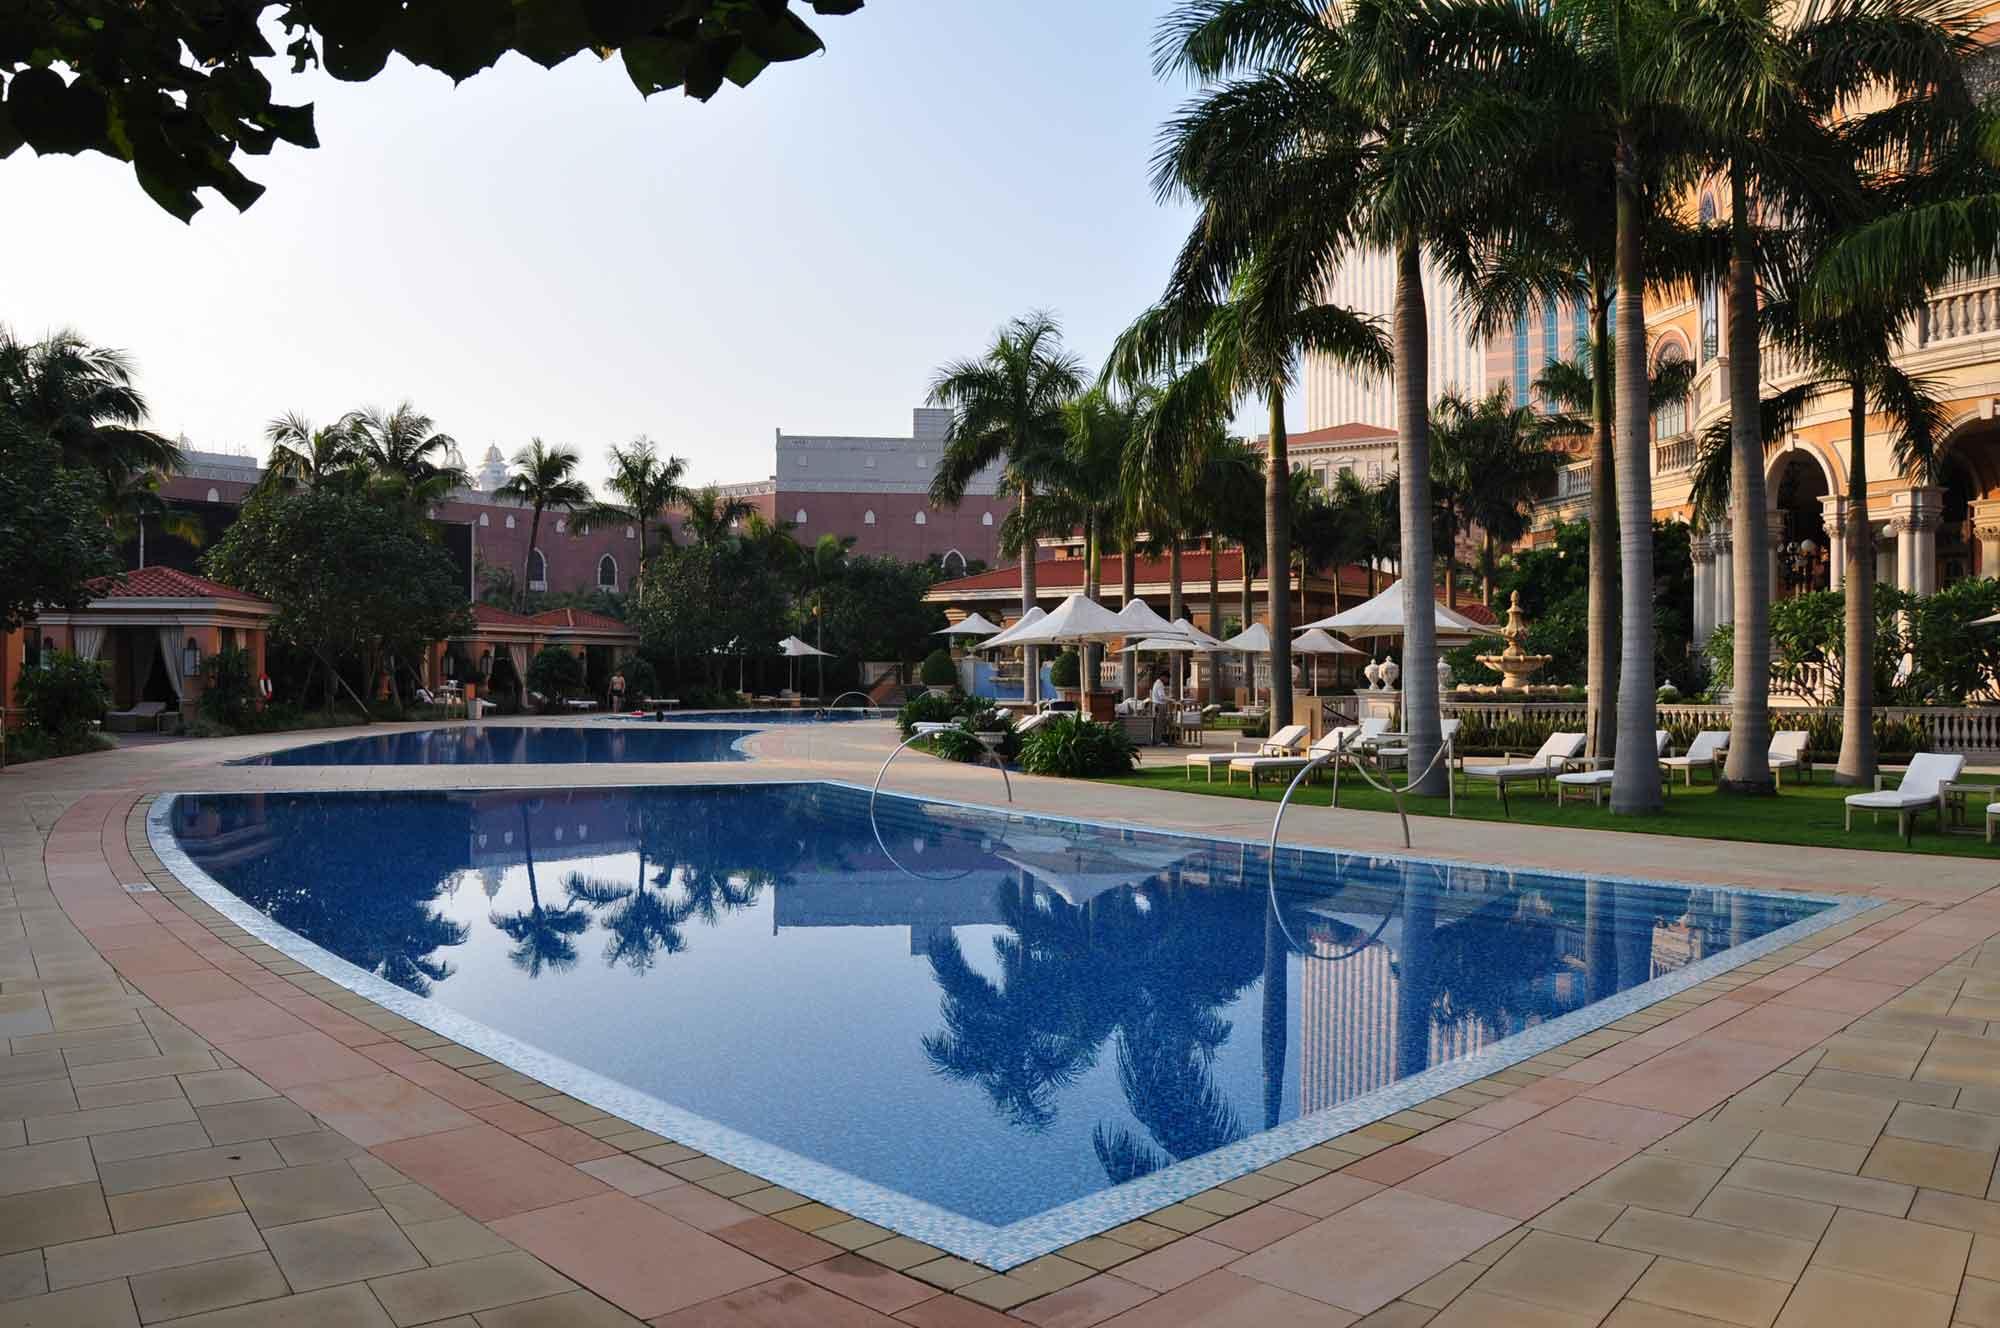 Four Seasons Macau outdoor swmming pool